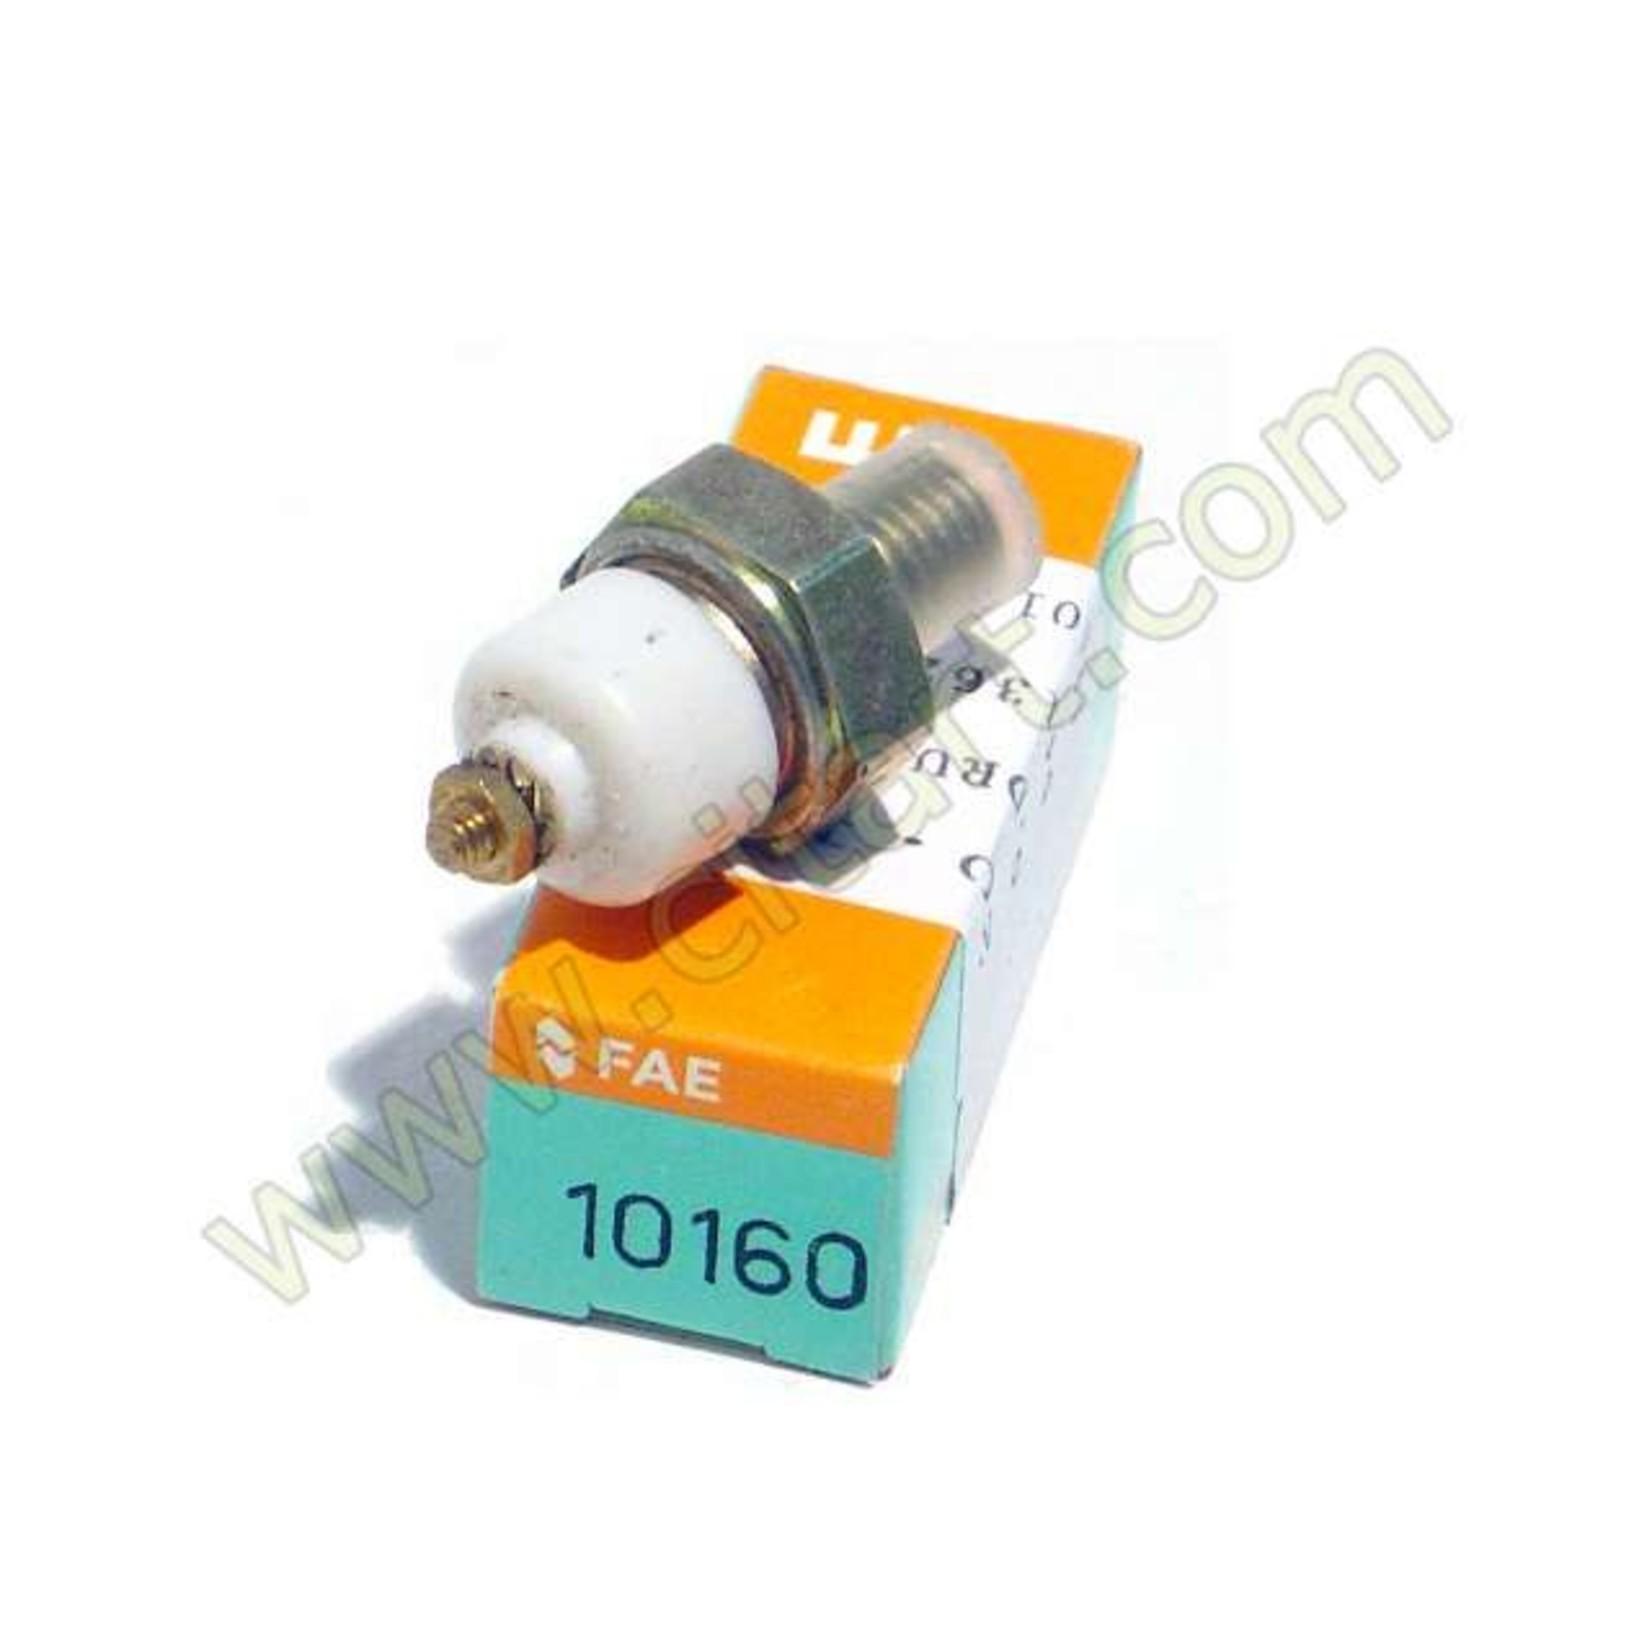 Oil pressure switch Nr Org: 5413615